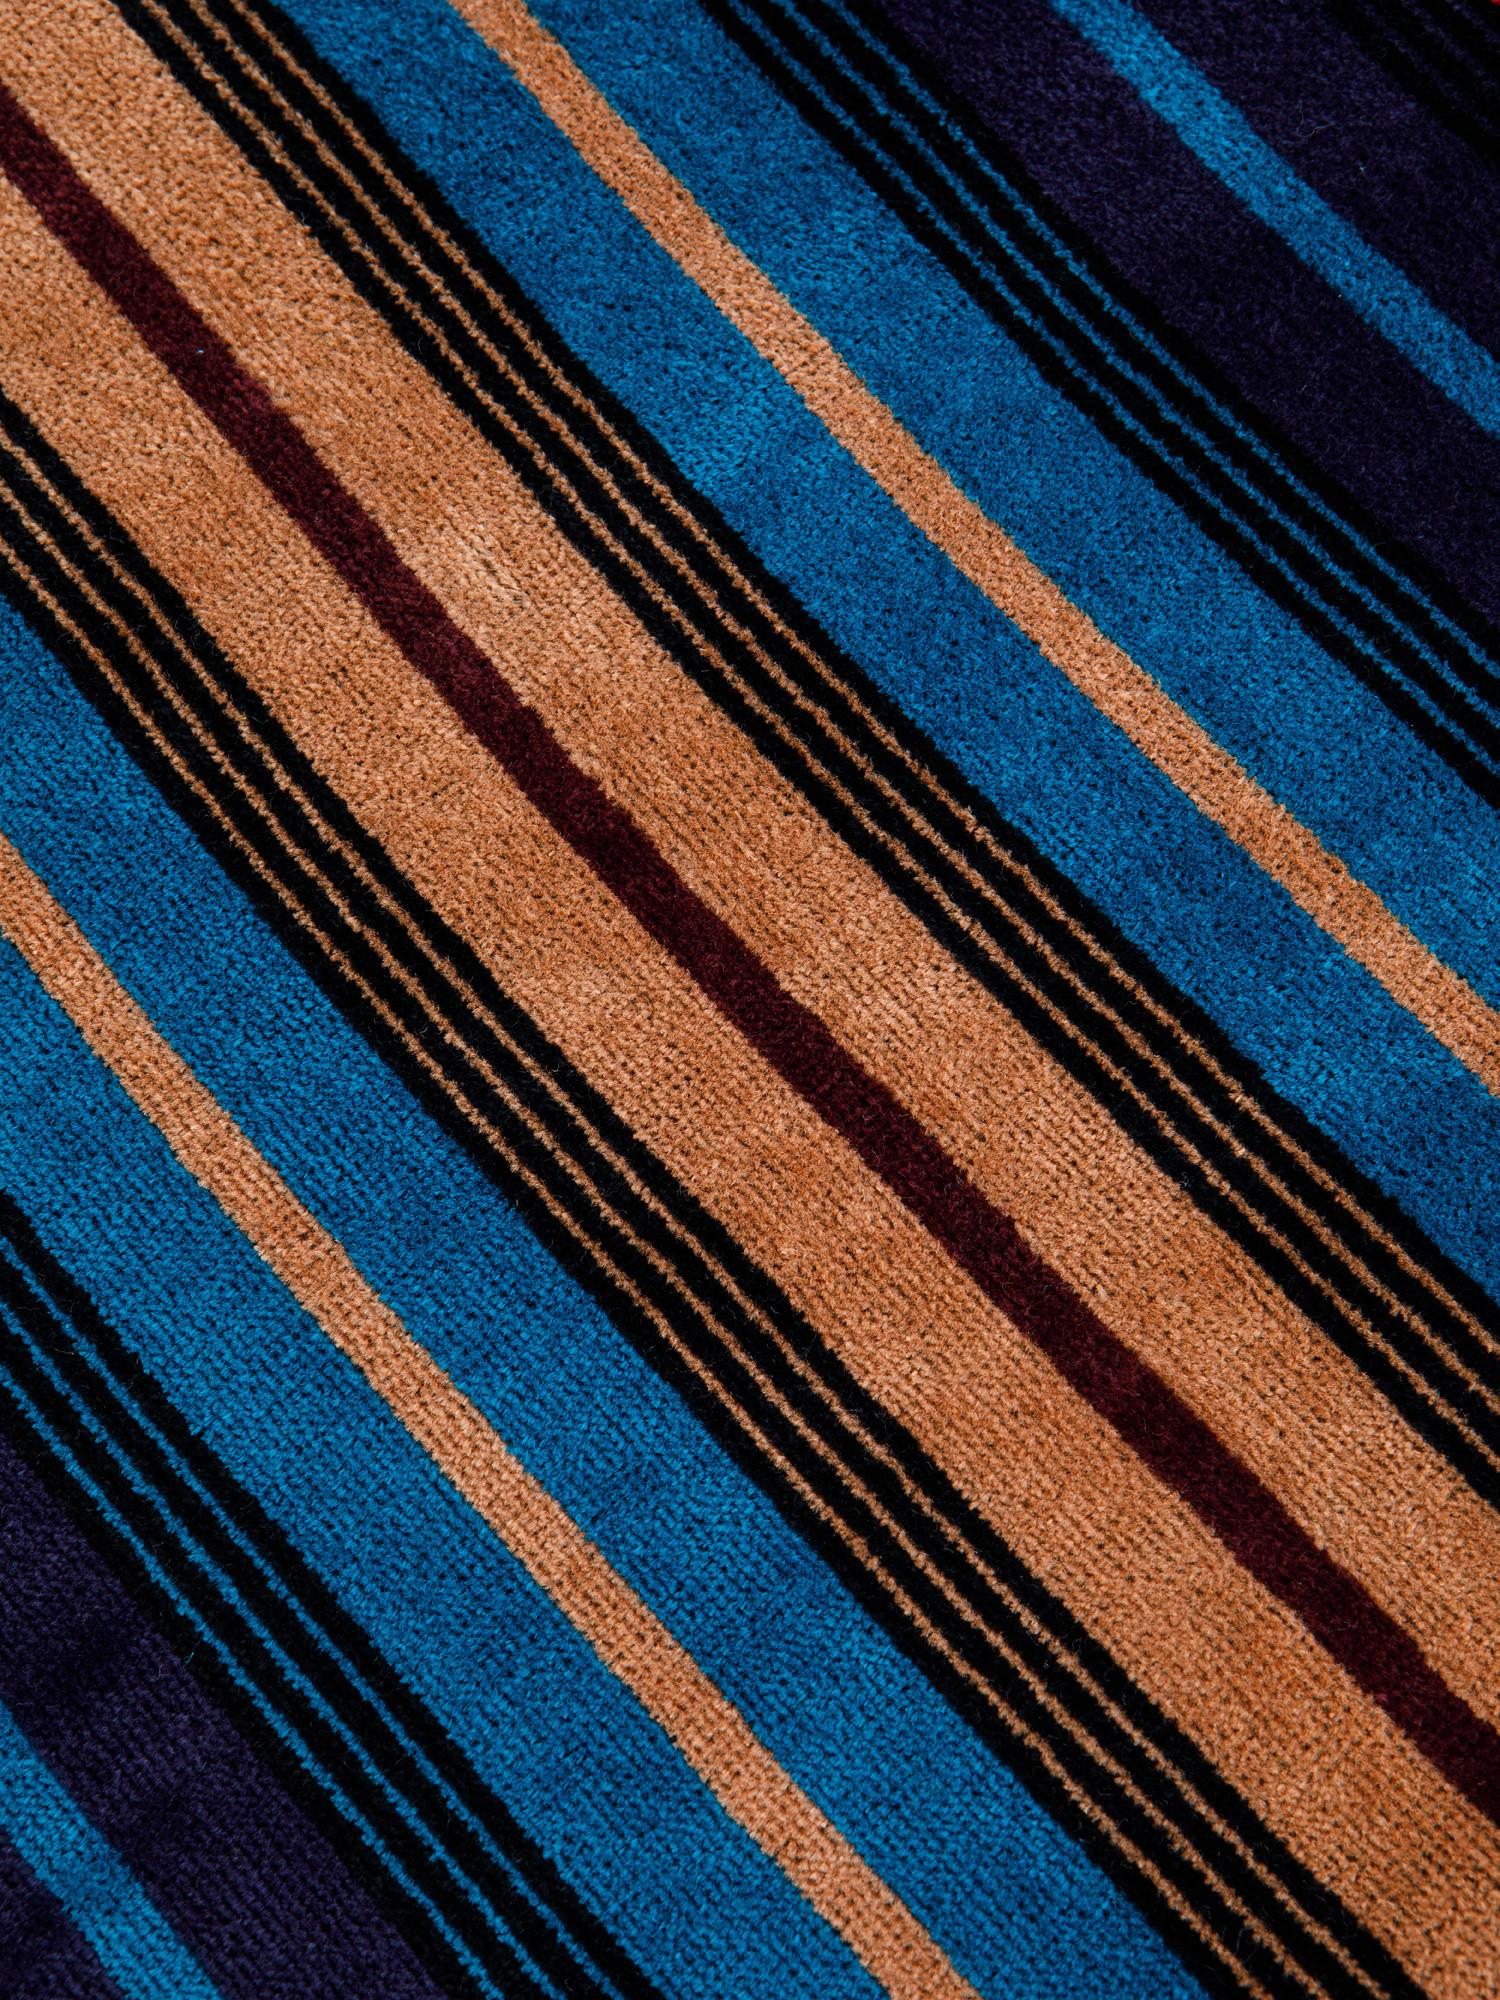 Asciugamano cotone velour motivo righe larghe, Multicolor, large image number 2